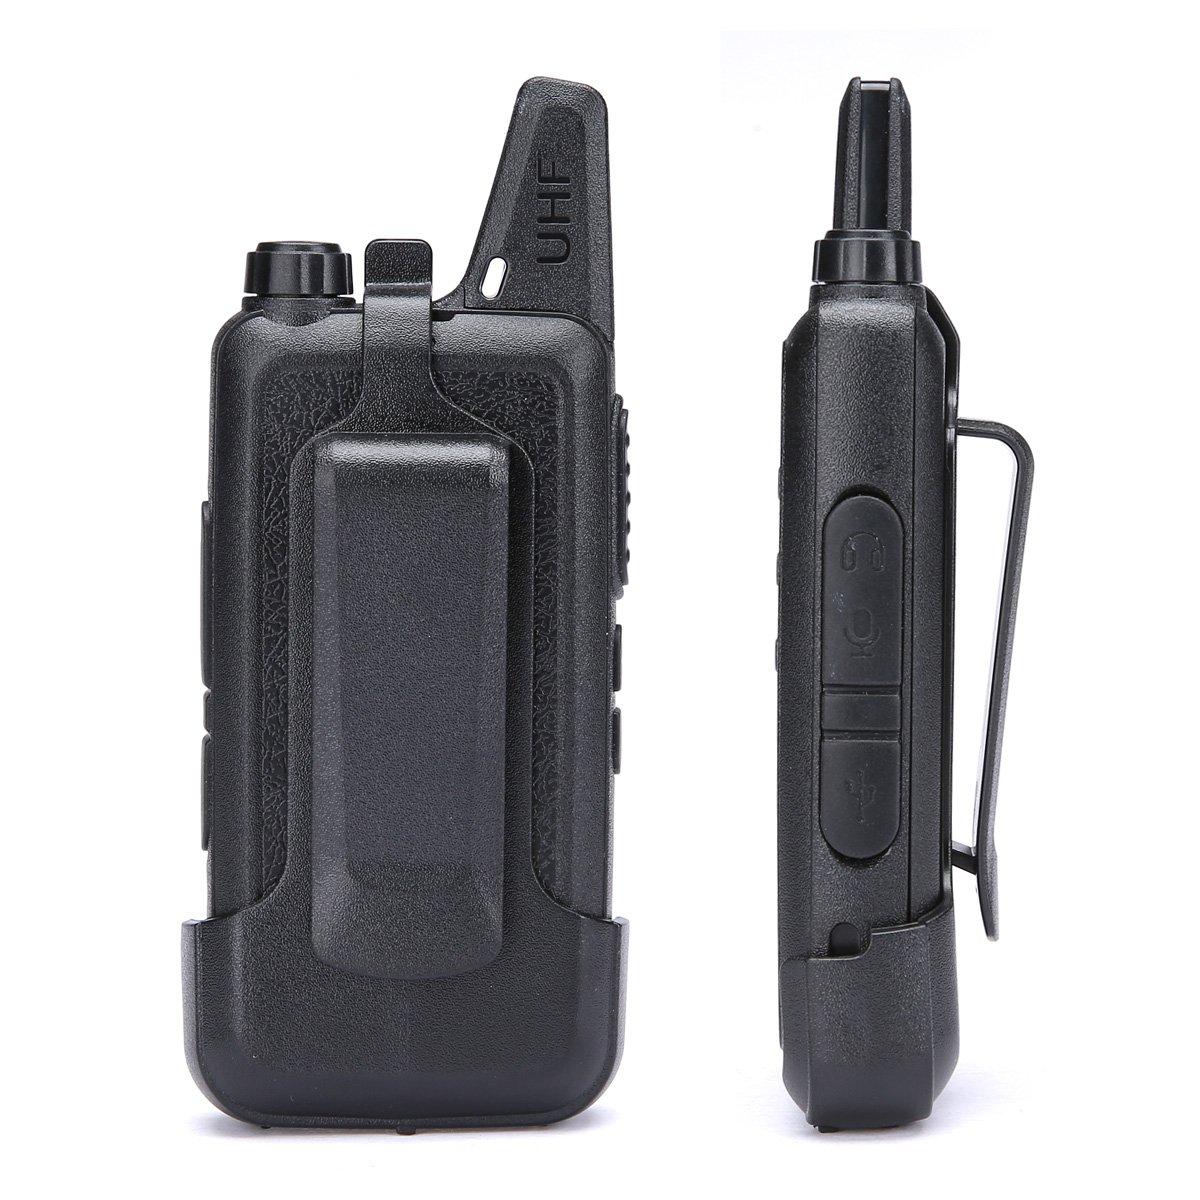 LUITON Mini Kids Walkie Talkies with Micro USB Charging LT-316 Uhf Two Way Radio (10 Pcs) by LUITON (Image #5)